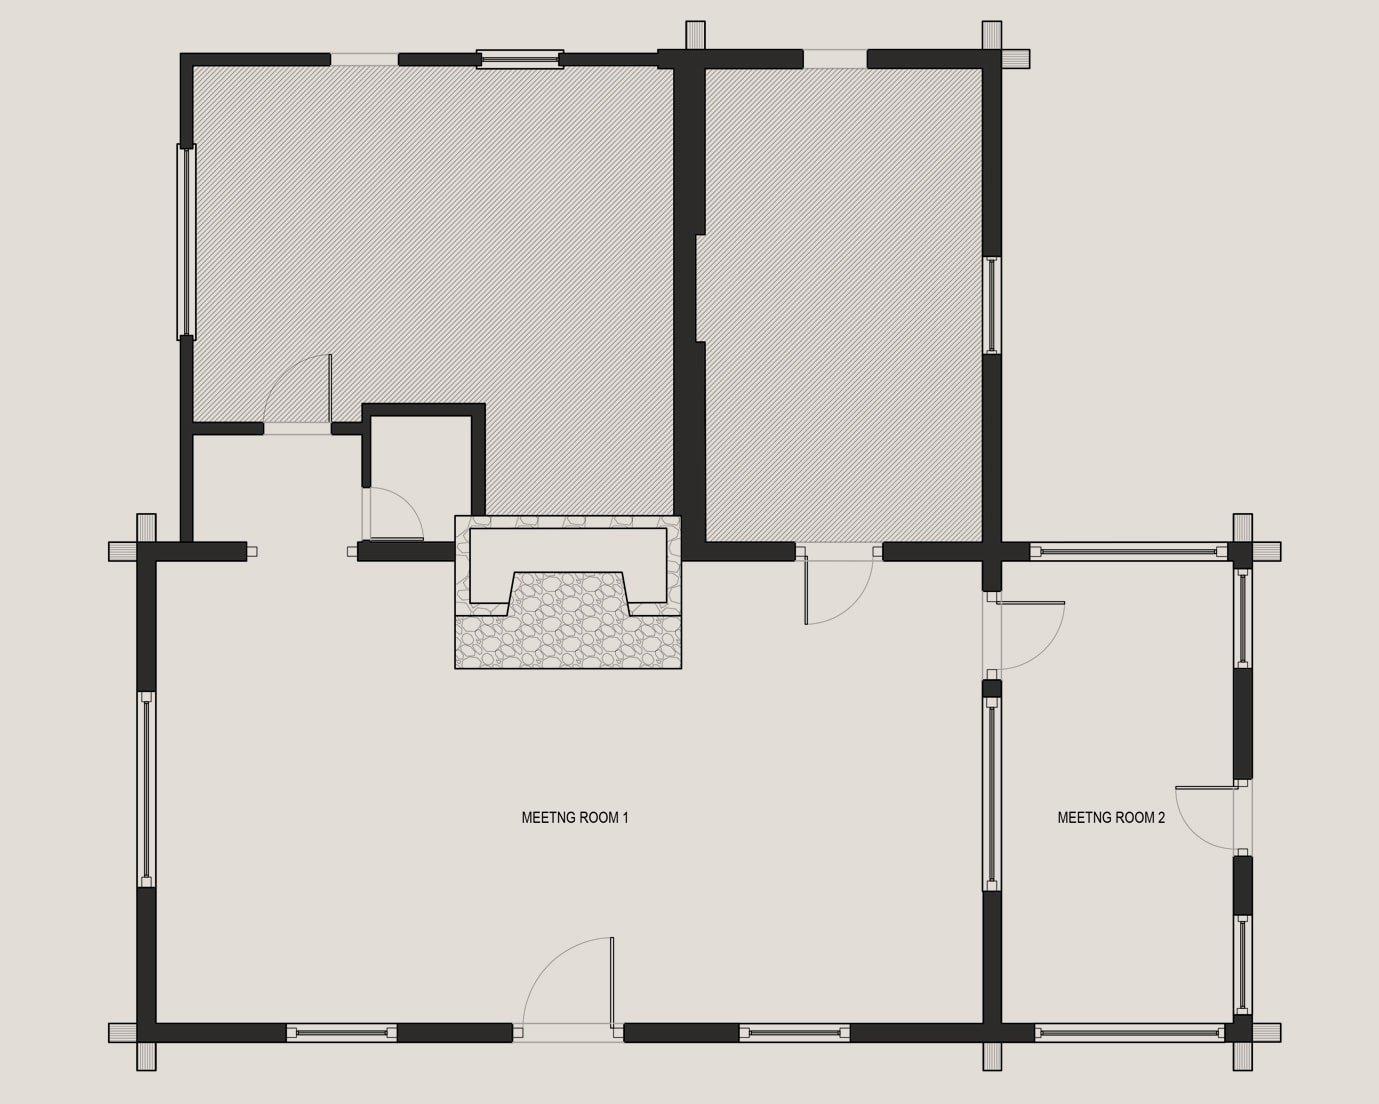 lmr-floorplan-bk-min.jpg